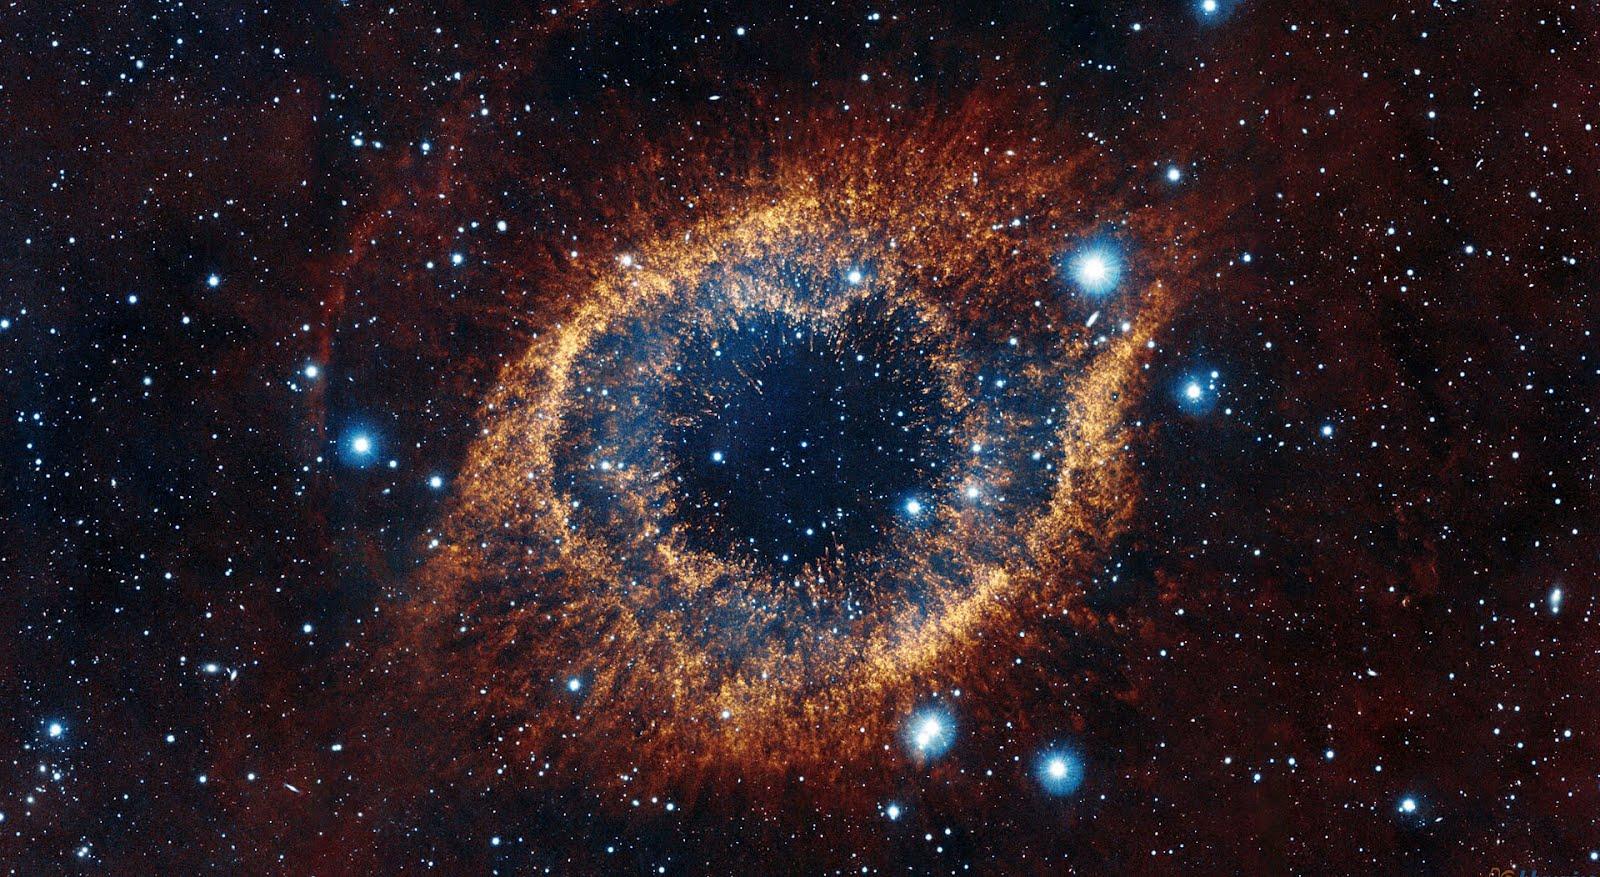 http://4.bp.blogspot.com/-3aK7MOy9jRU/T4cUu2Pb5LI/AAAAAAAAAic/ol7A7yr0RcI/s1600/helix_nebula_infrared.jpg